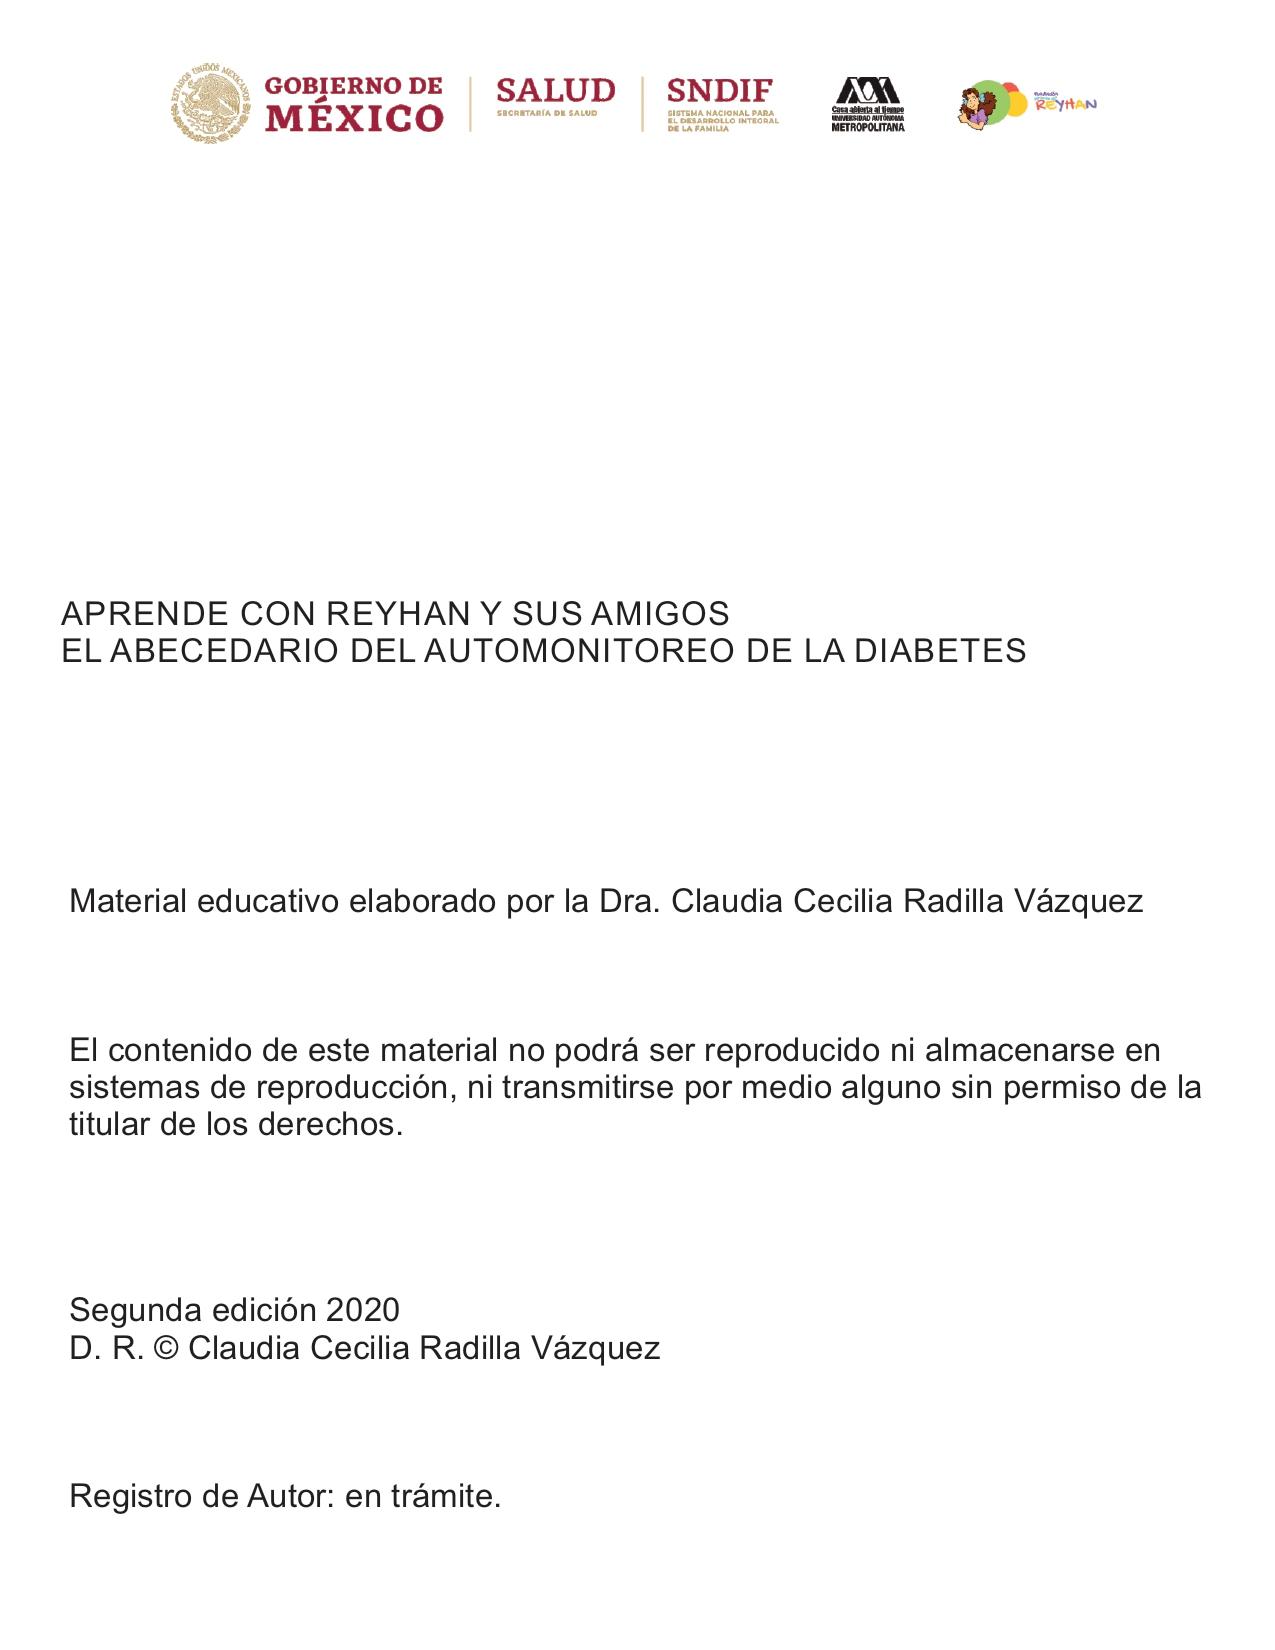 ABC automonitoreo diabetes_pages-to-jpg-0002